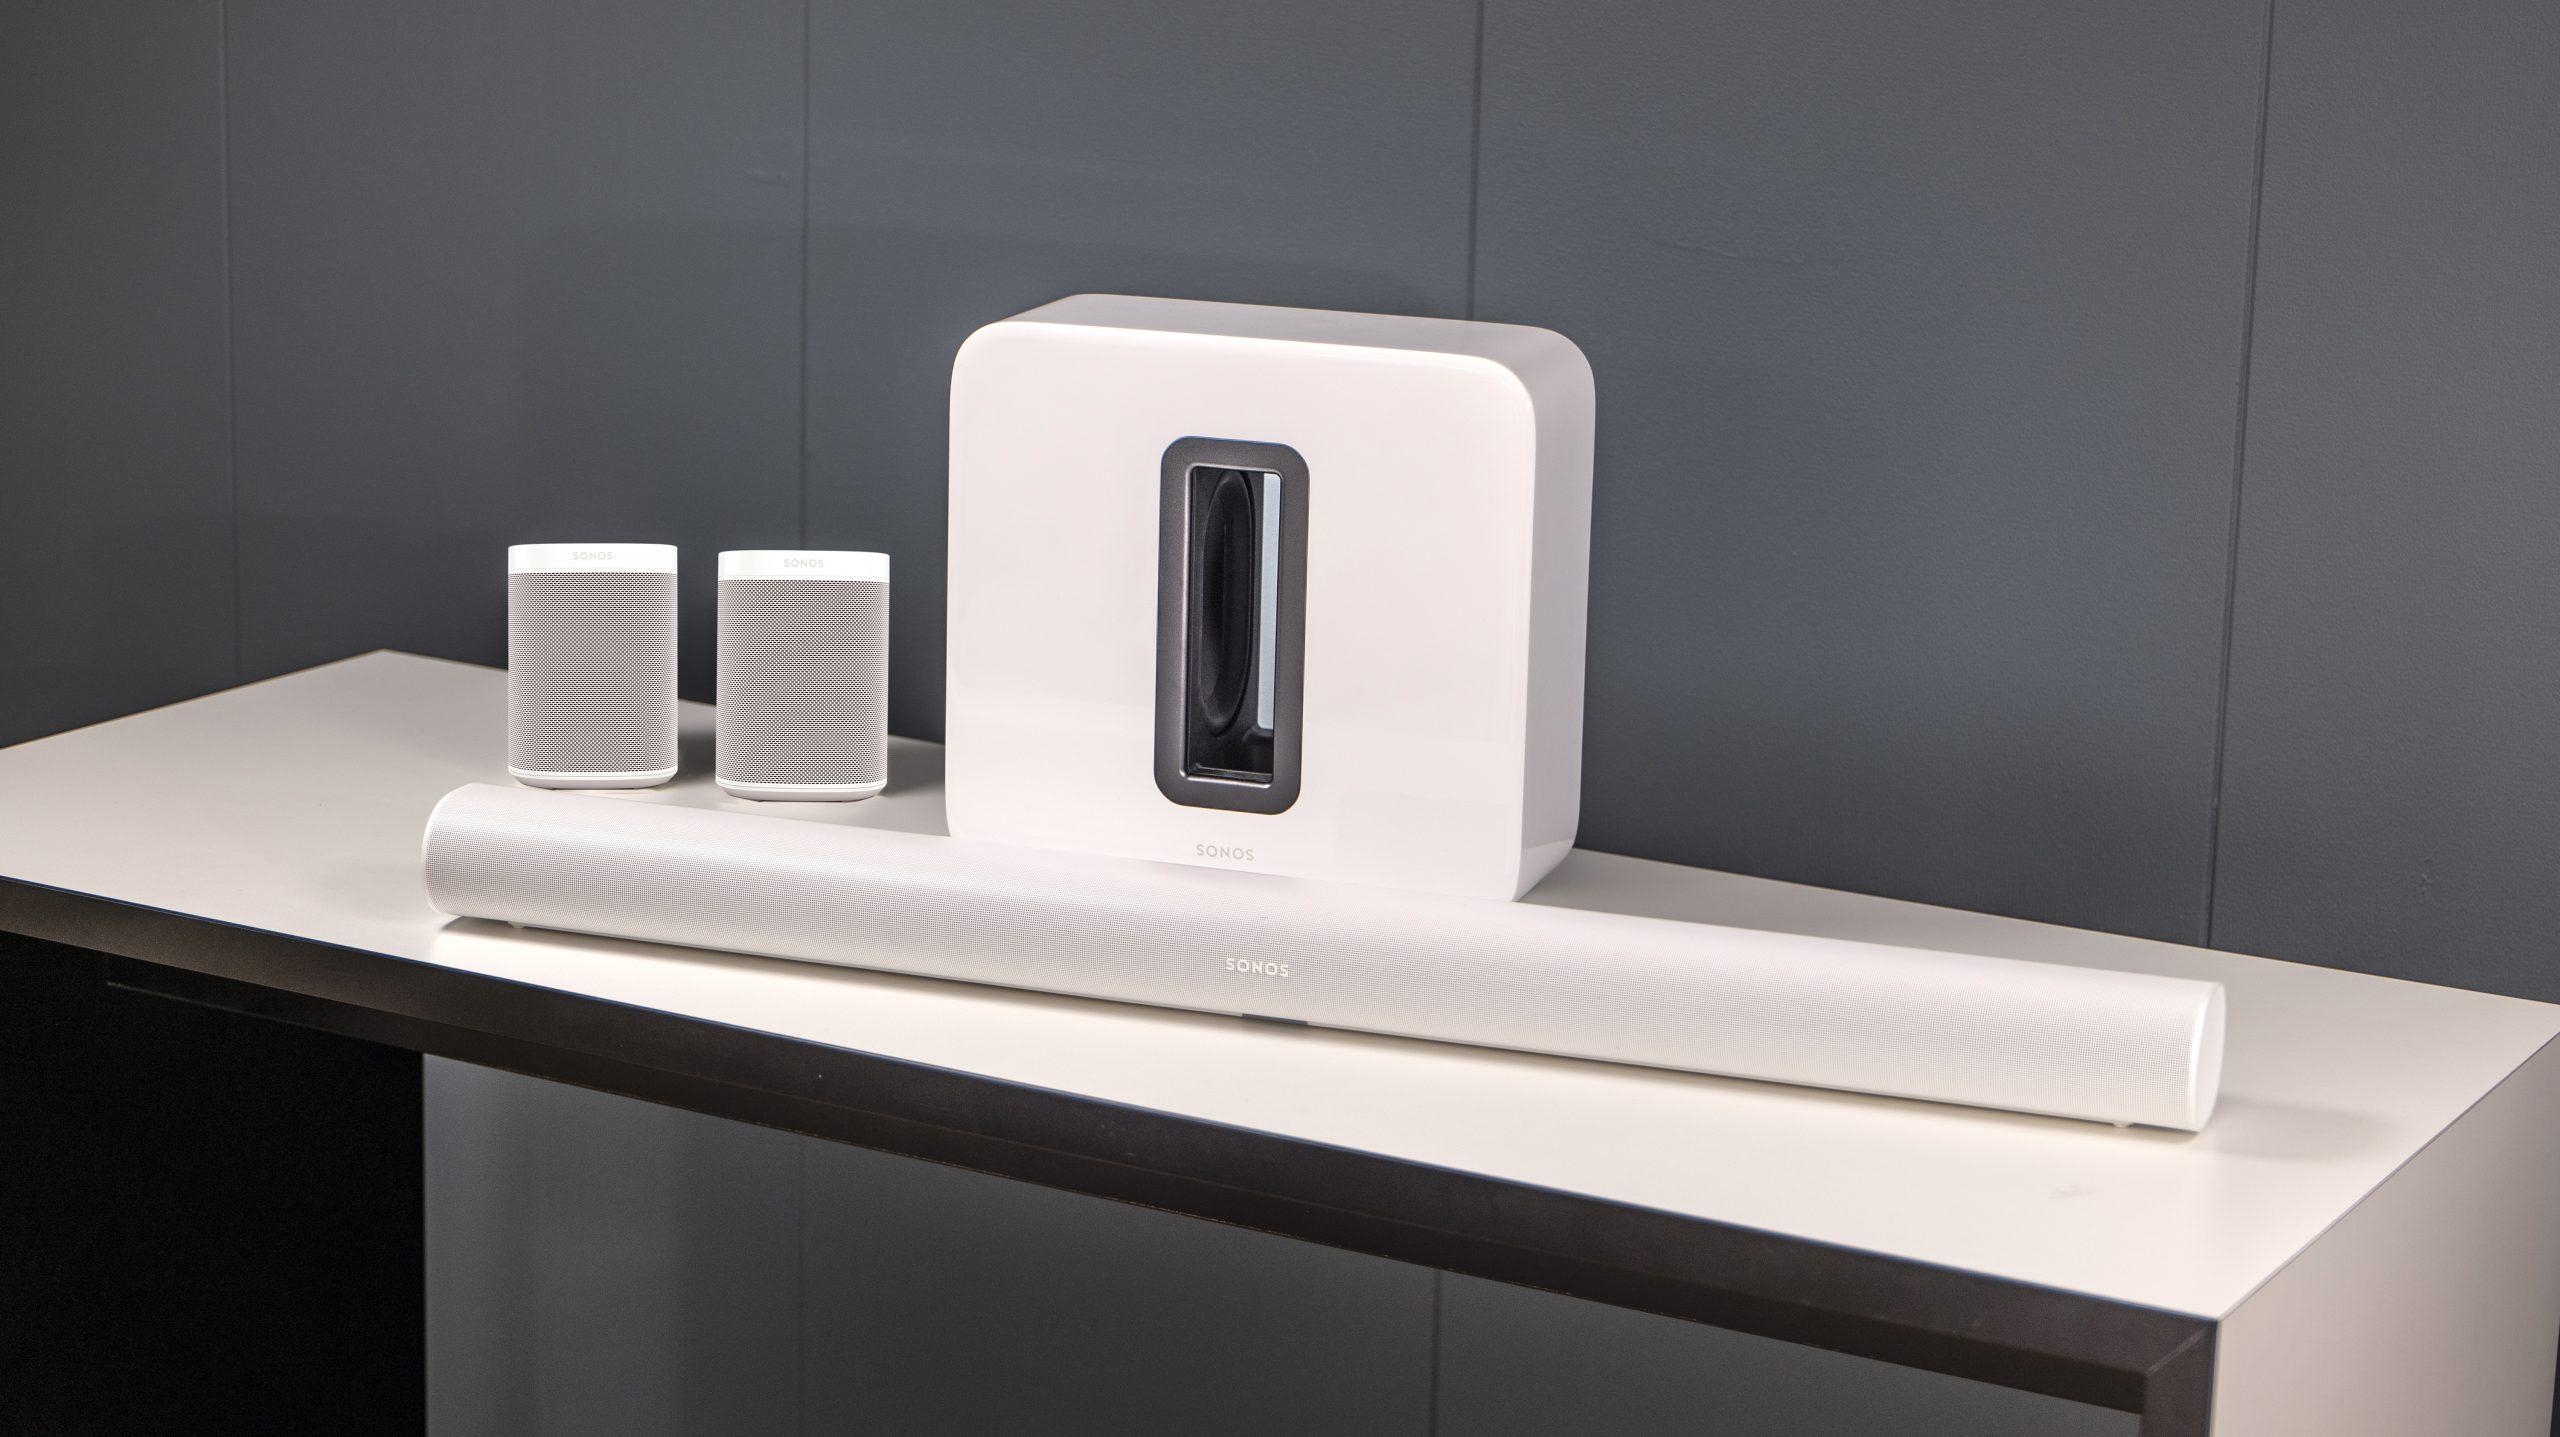 Sonos Arc, Sub (Gen 3), 2 x One SL. Photo: Geir Gråbein Nordby